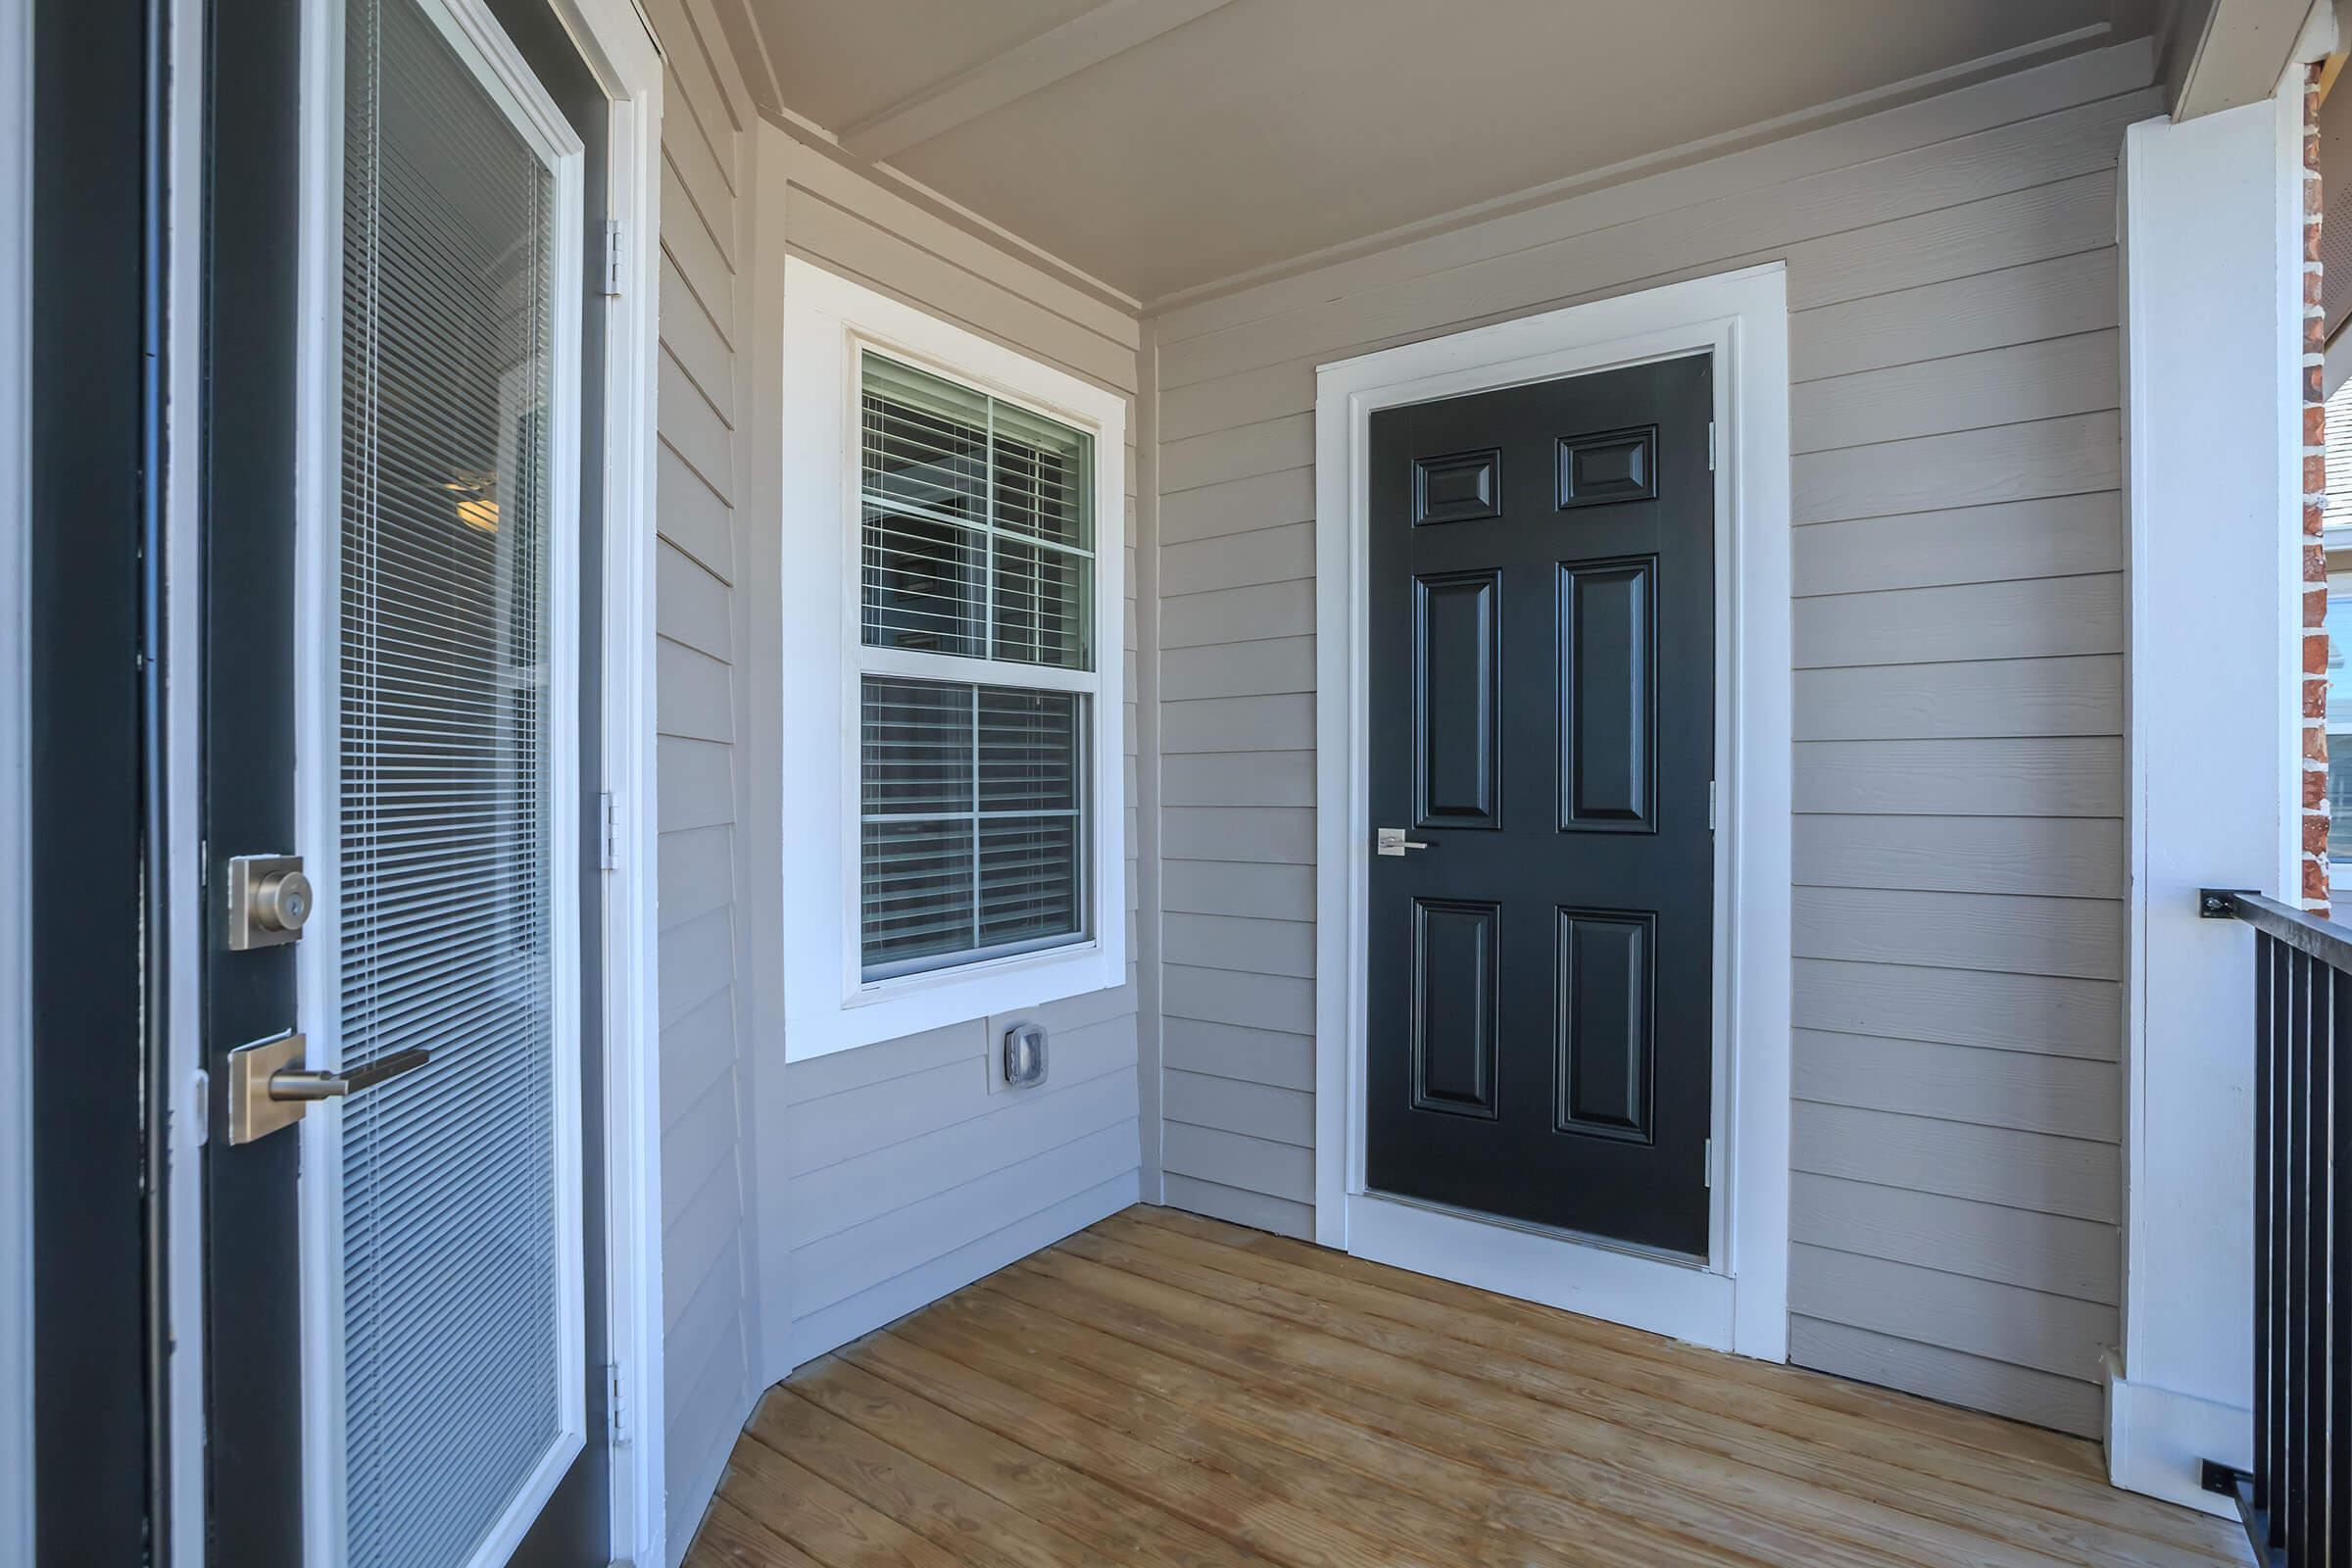 a door with a window in a room